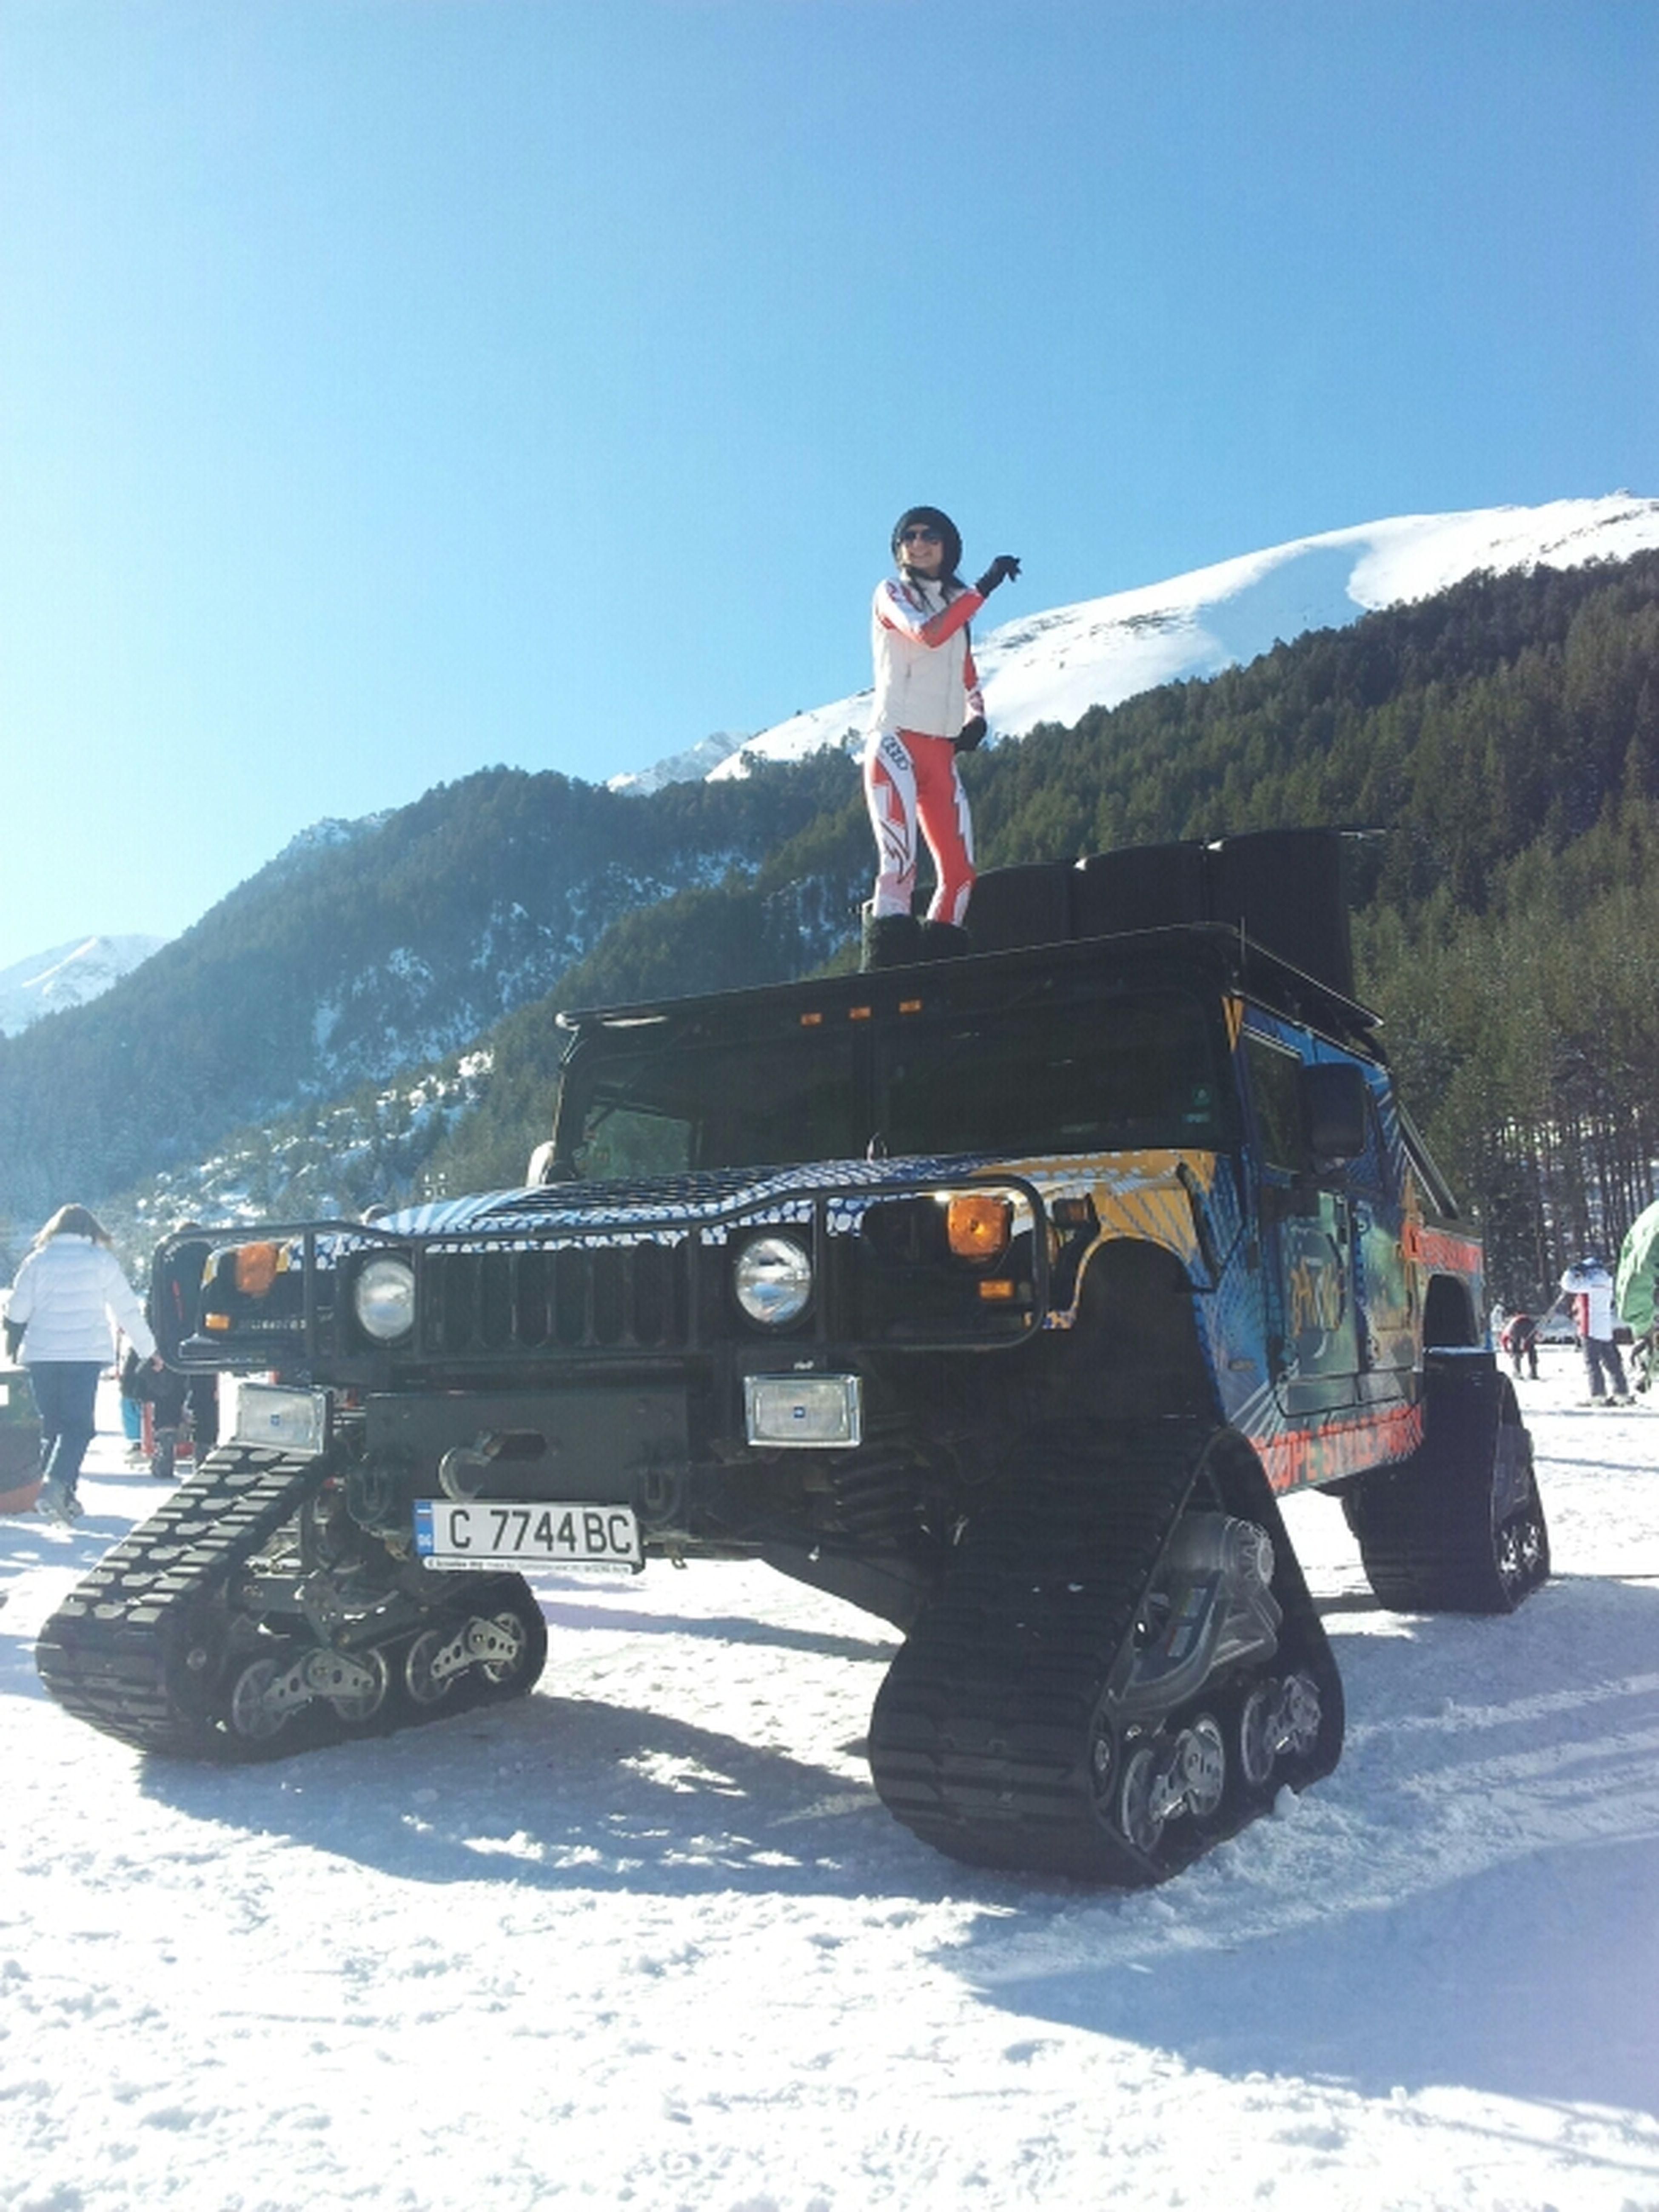 Relaxing Taking Photos Photo Snow Ski Snowboarding Hummer Bansko Hoppa New Year Style